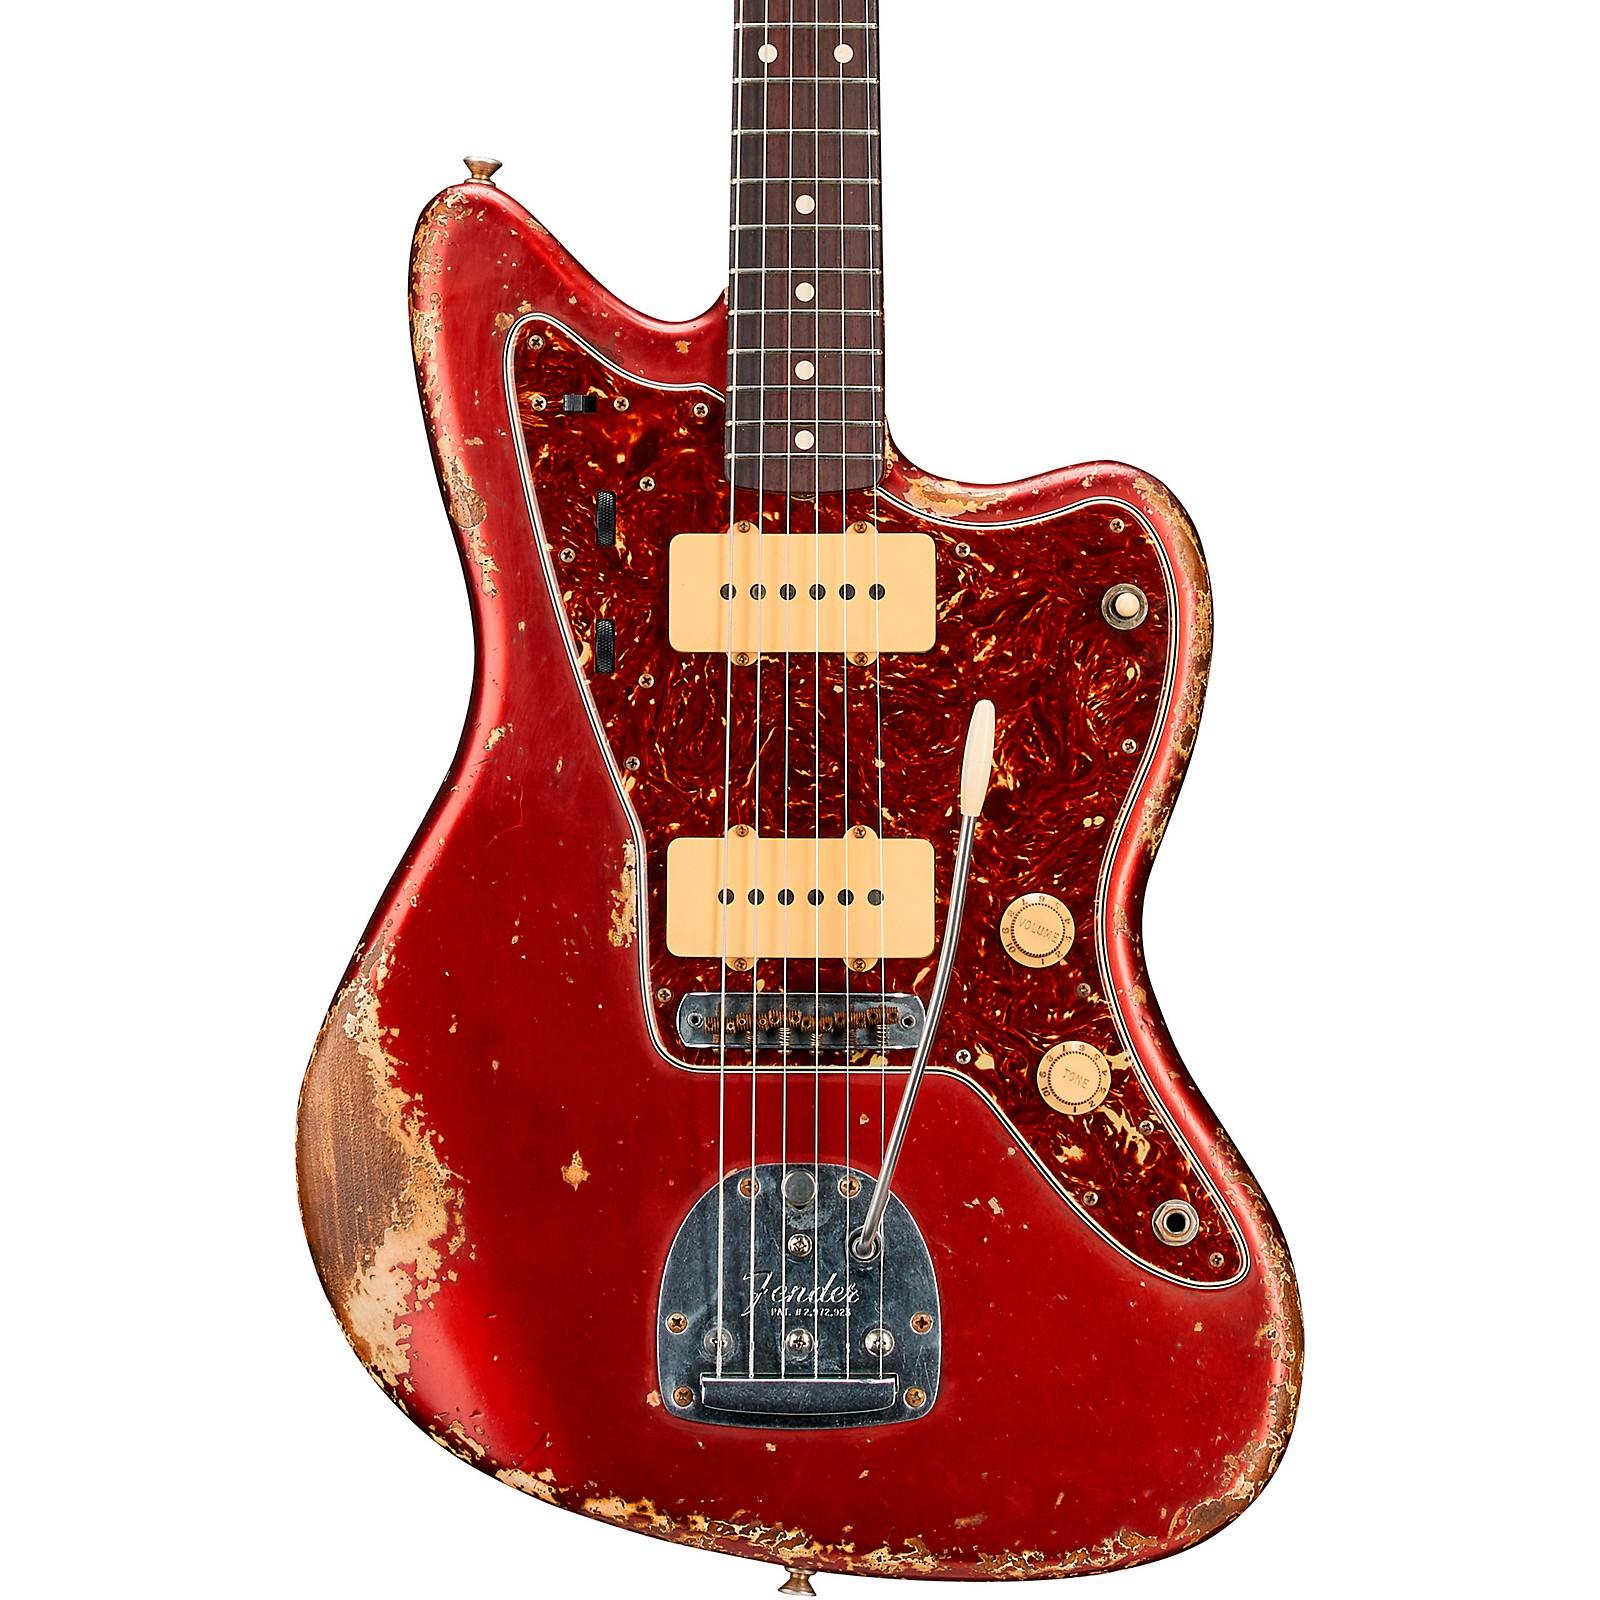 Fender Custom Shop 1962 Jazzmaster Heavy Relic Rosewood Fingerboard Electric Guitar Built by Vincent Van Trigt